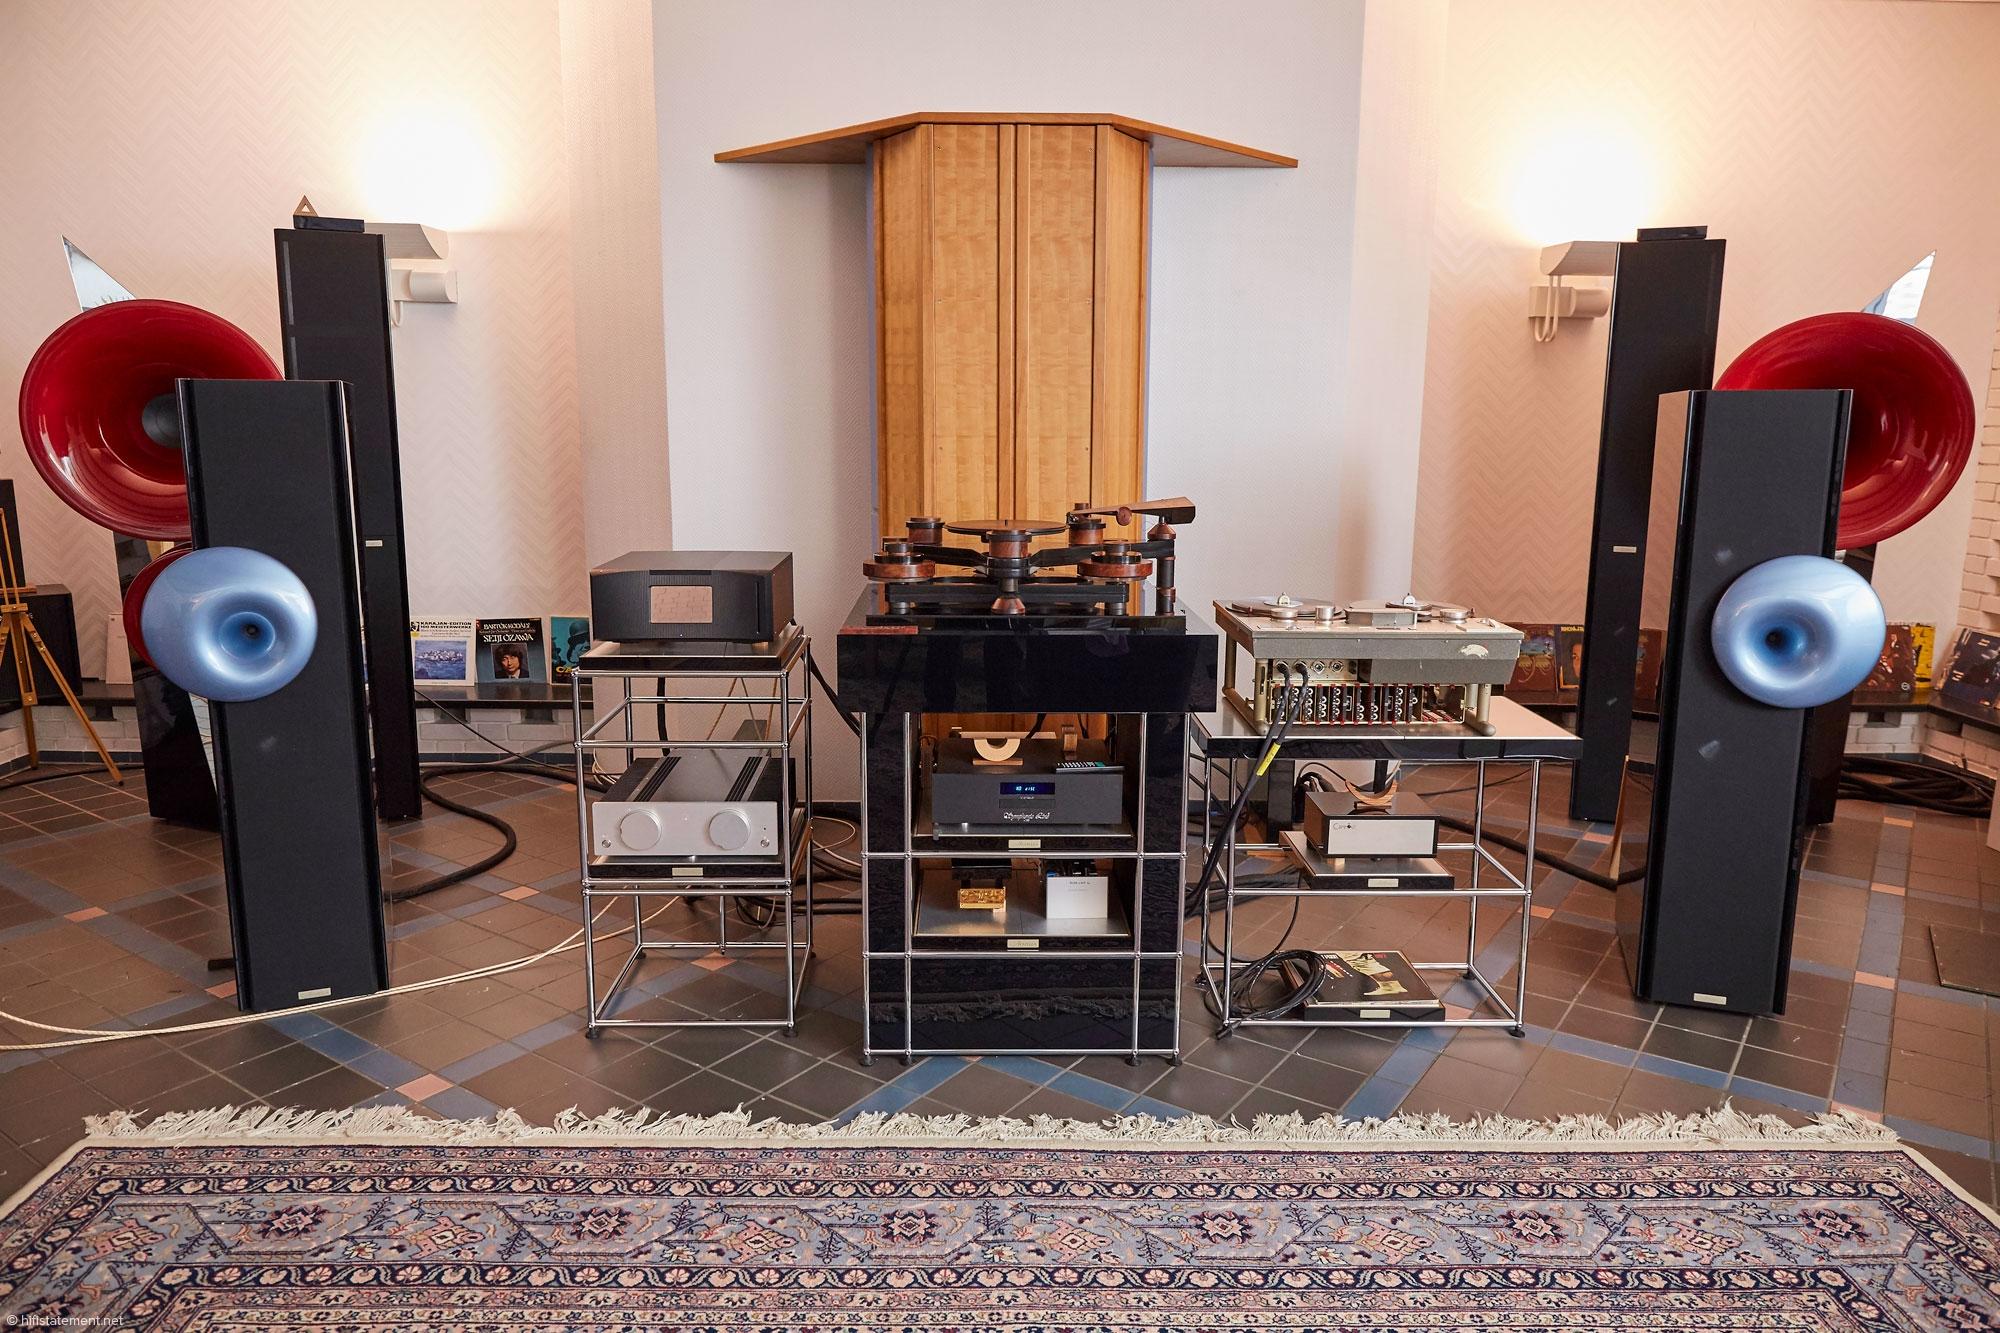 Feuilleton Acapella Audio Arts